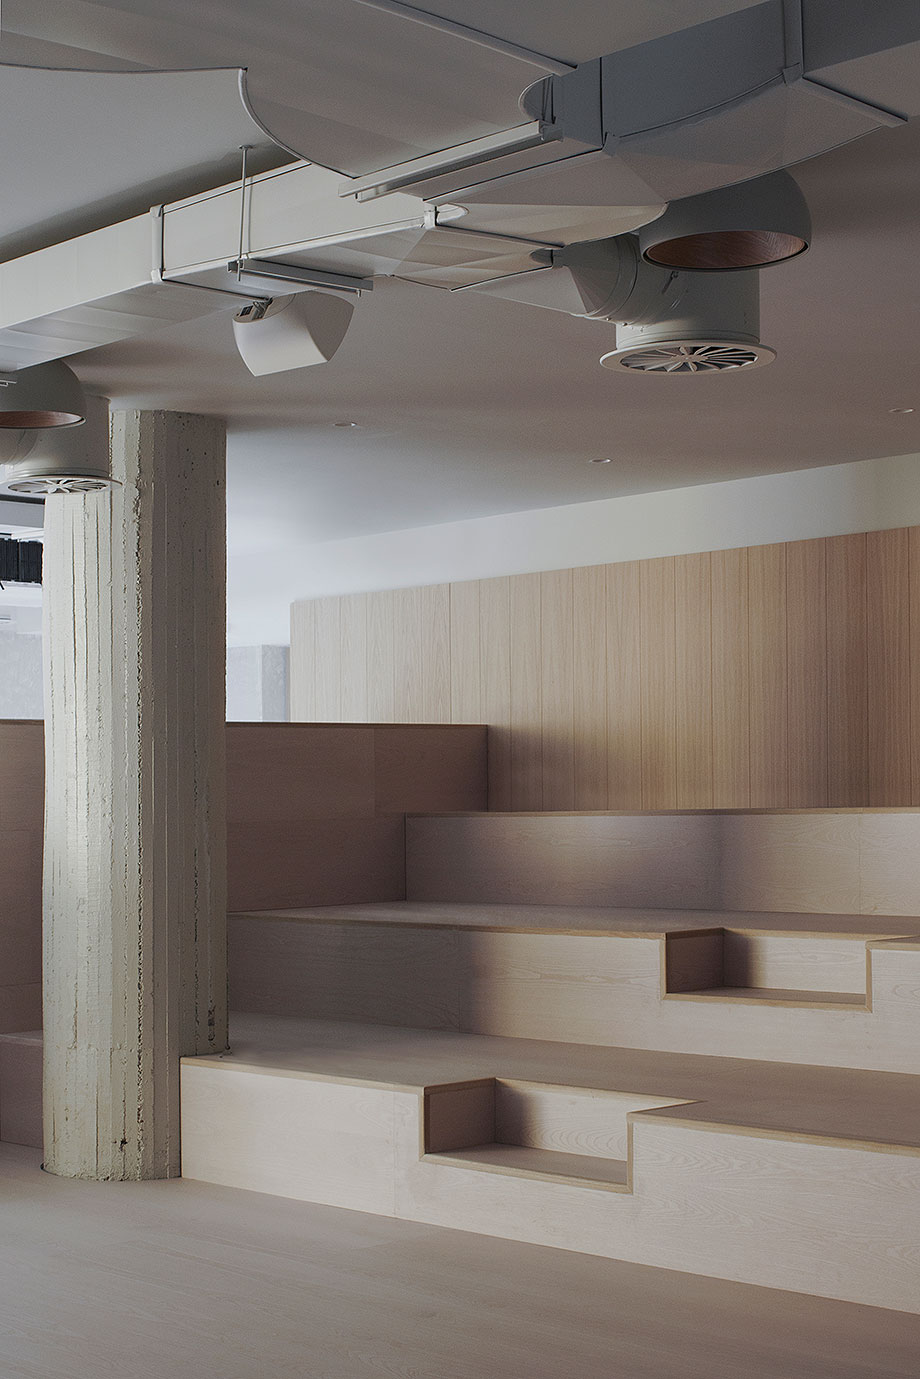 oficinas en madrid azora por francesc rife (19) - foto david zarzoso